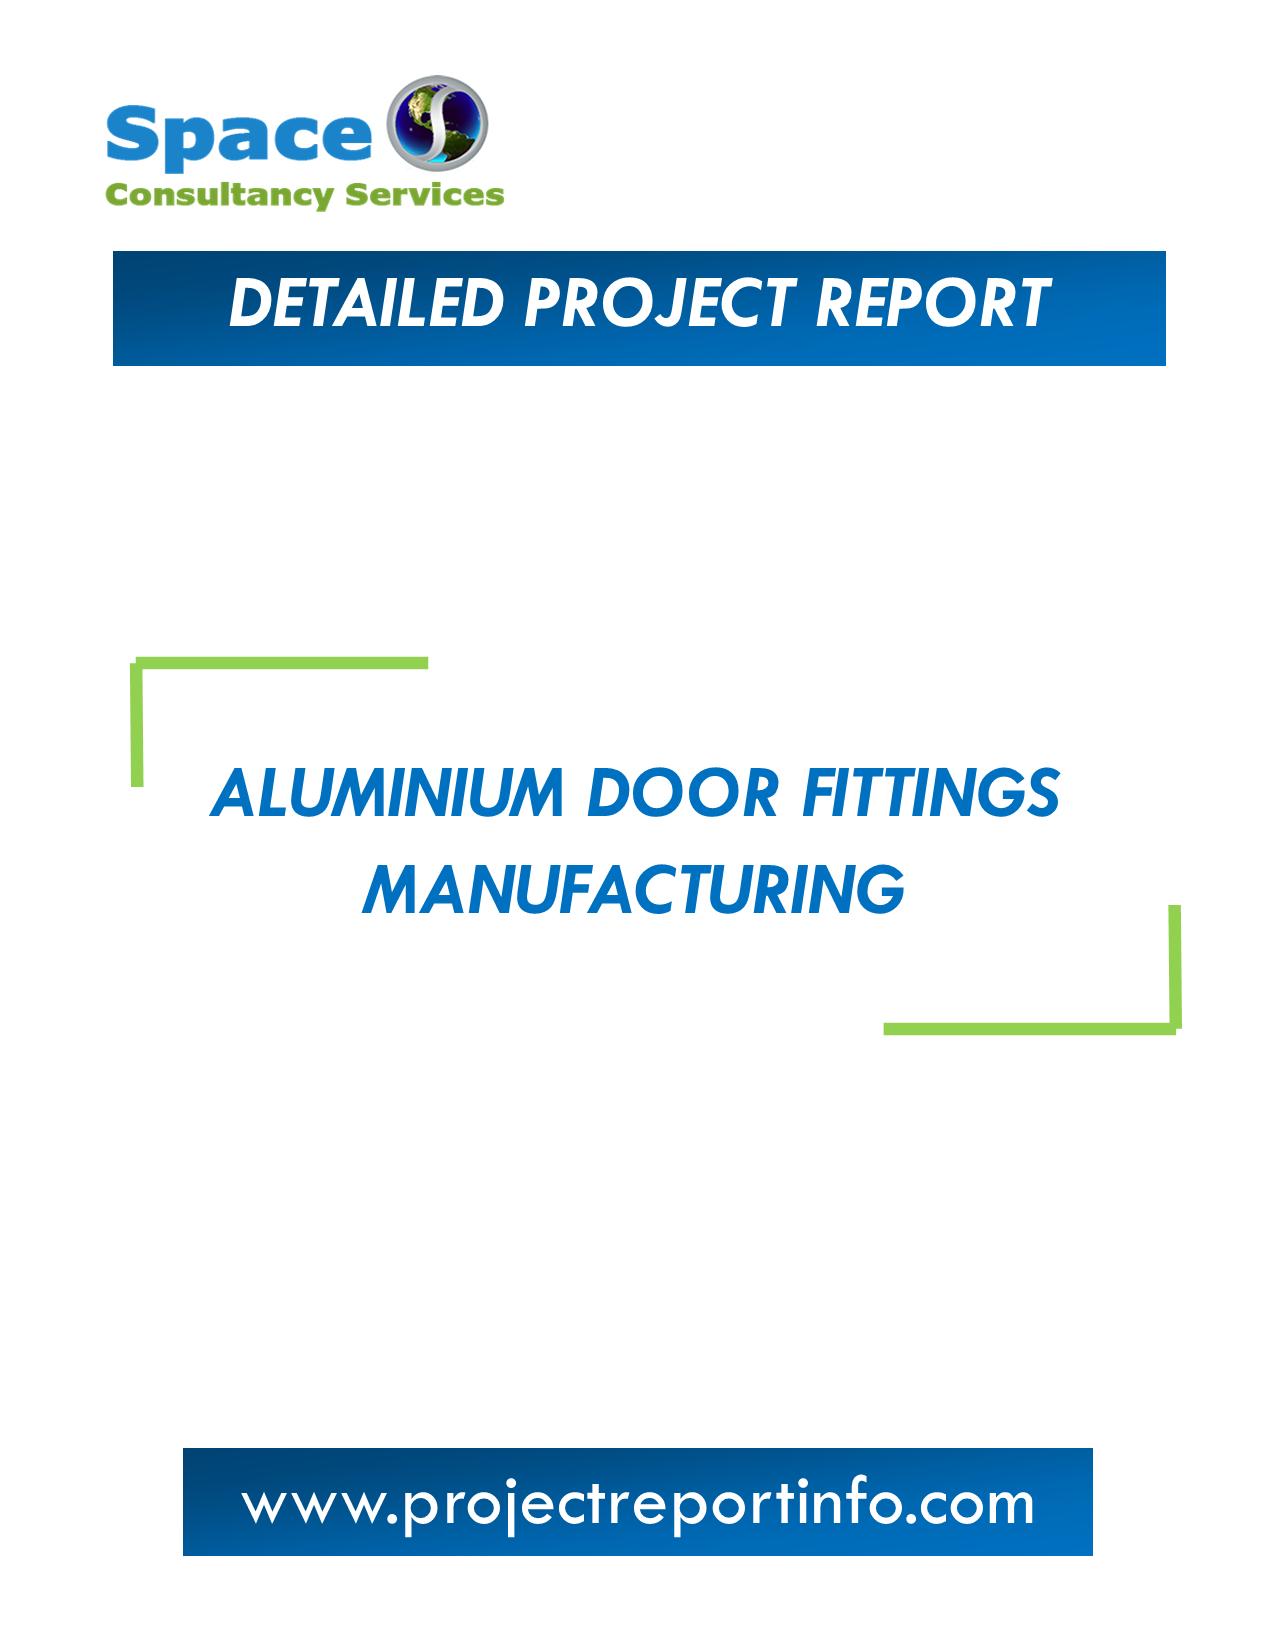 Project Report on Aluminium Door Fittings Manufacturing